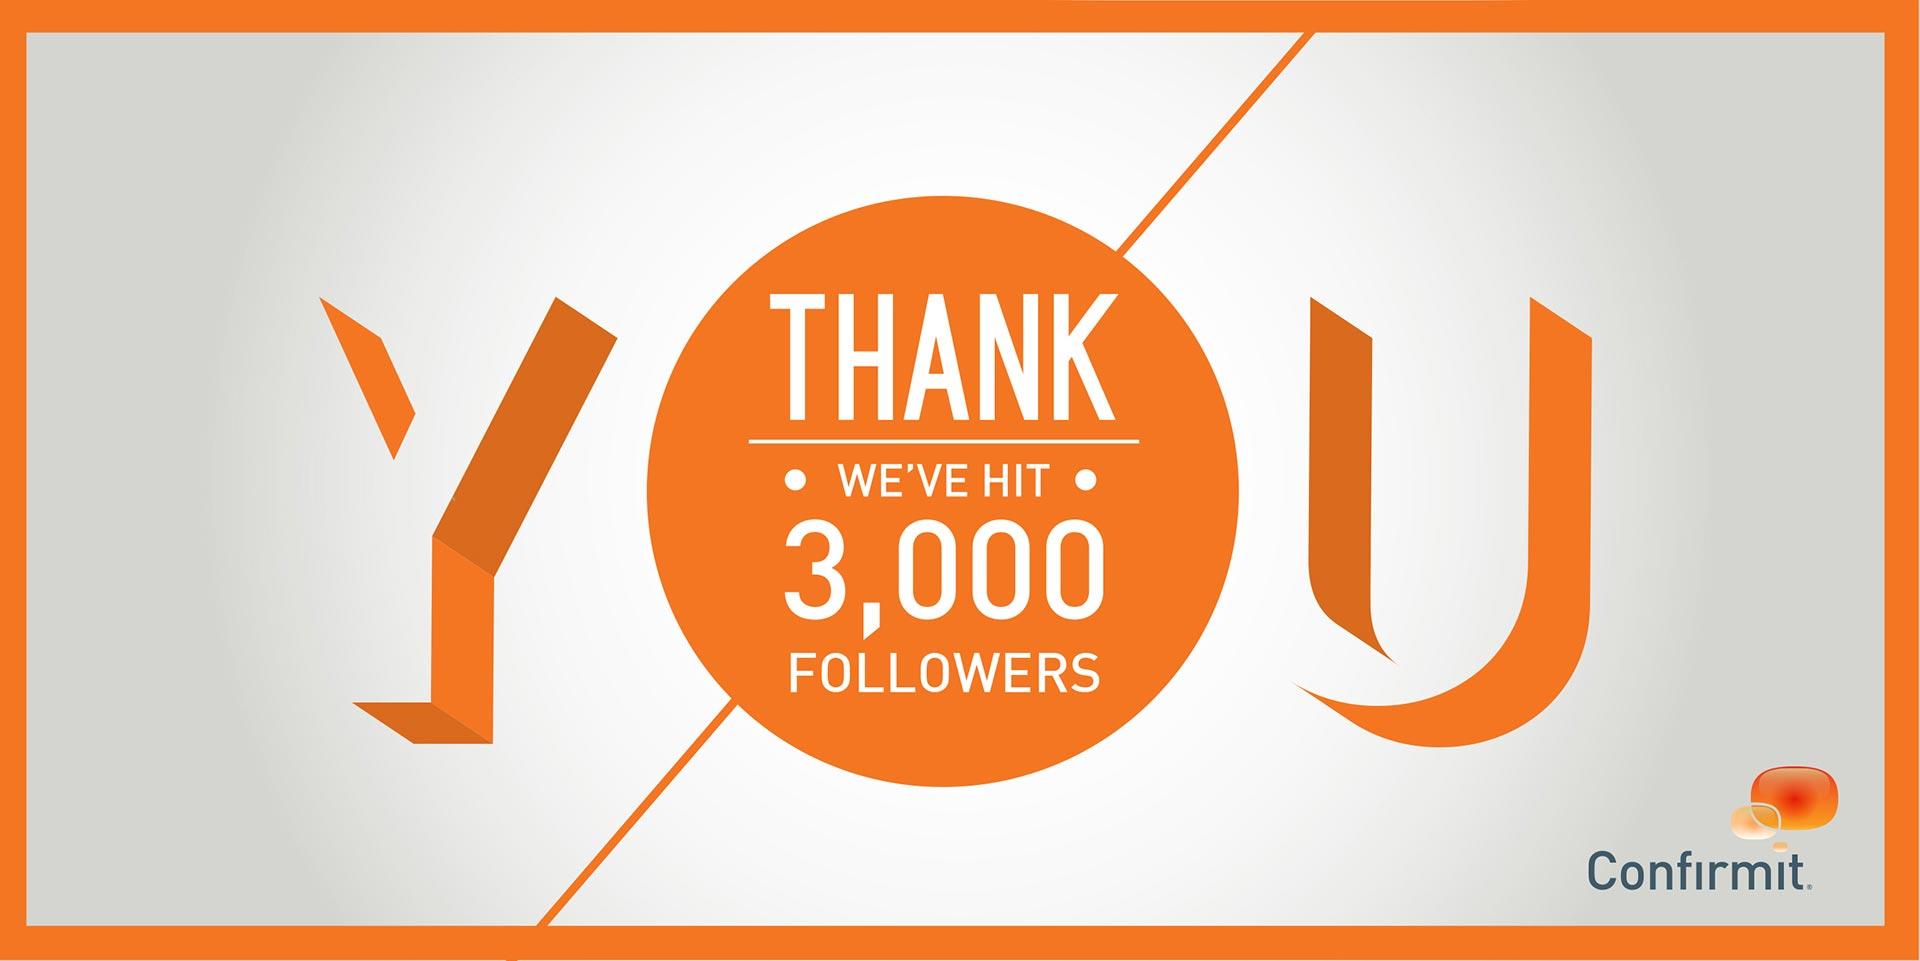 'Thank you' social media piece for 3,000 followers.